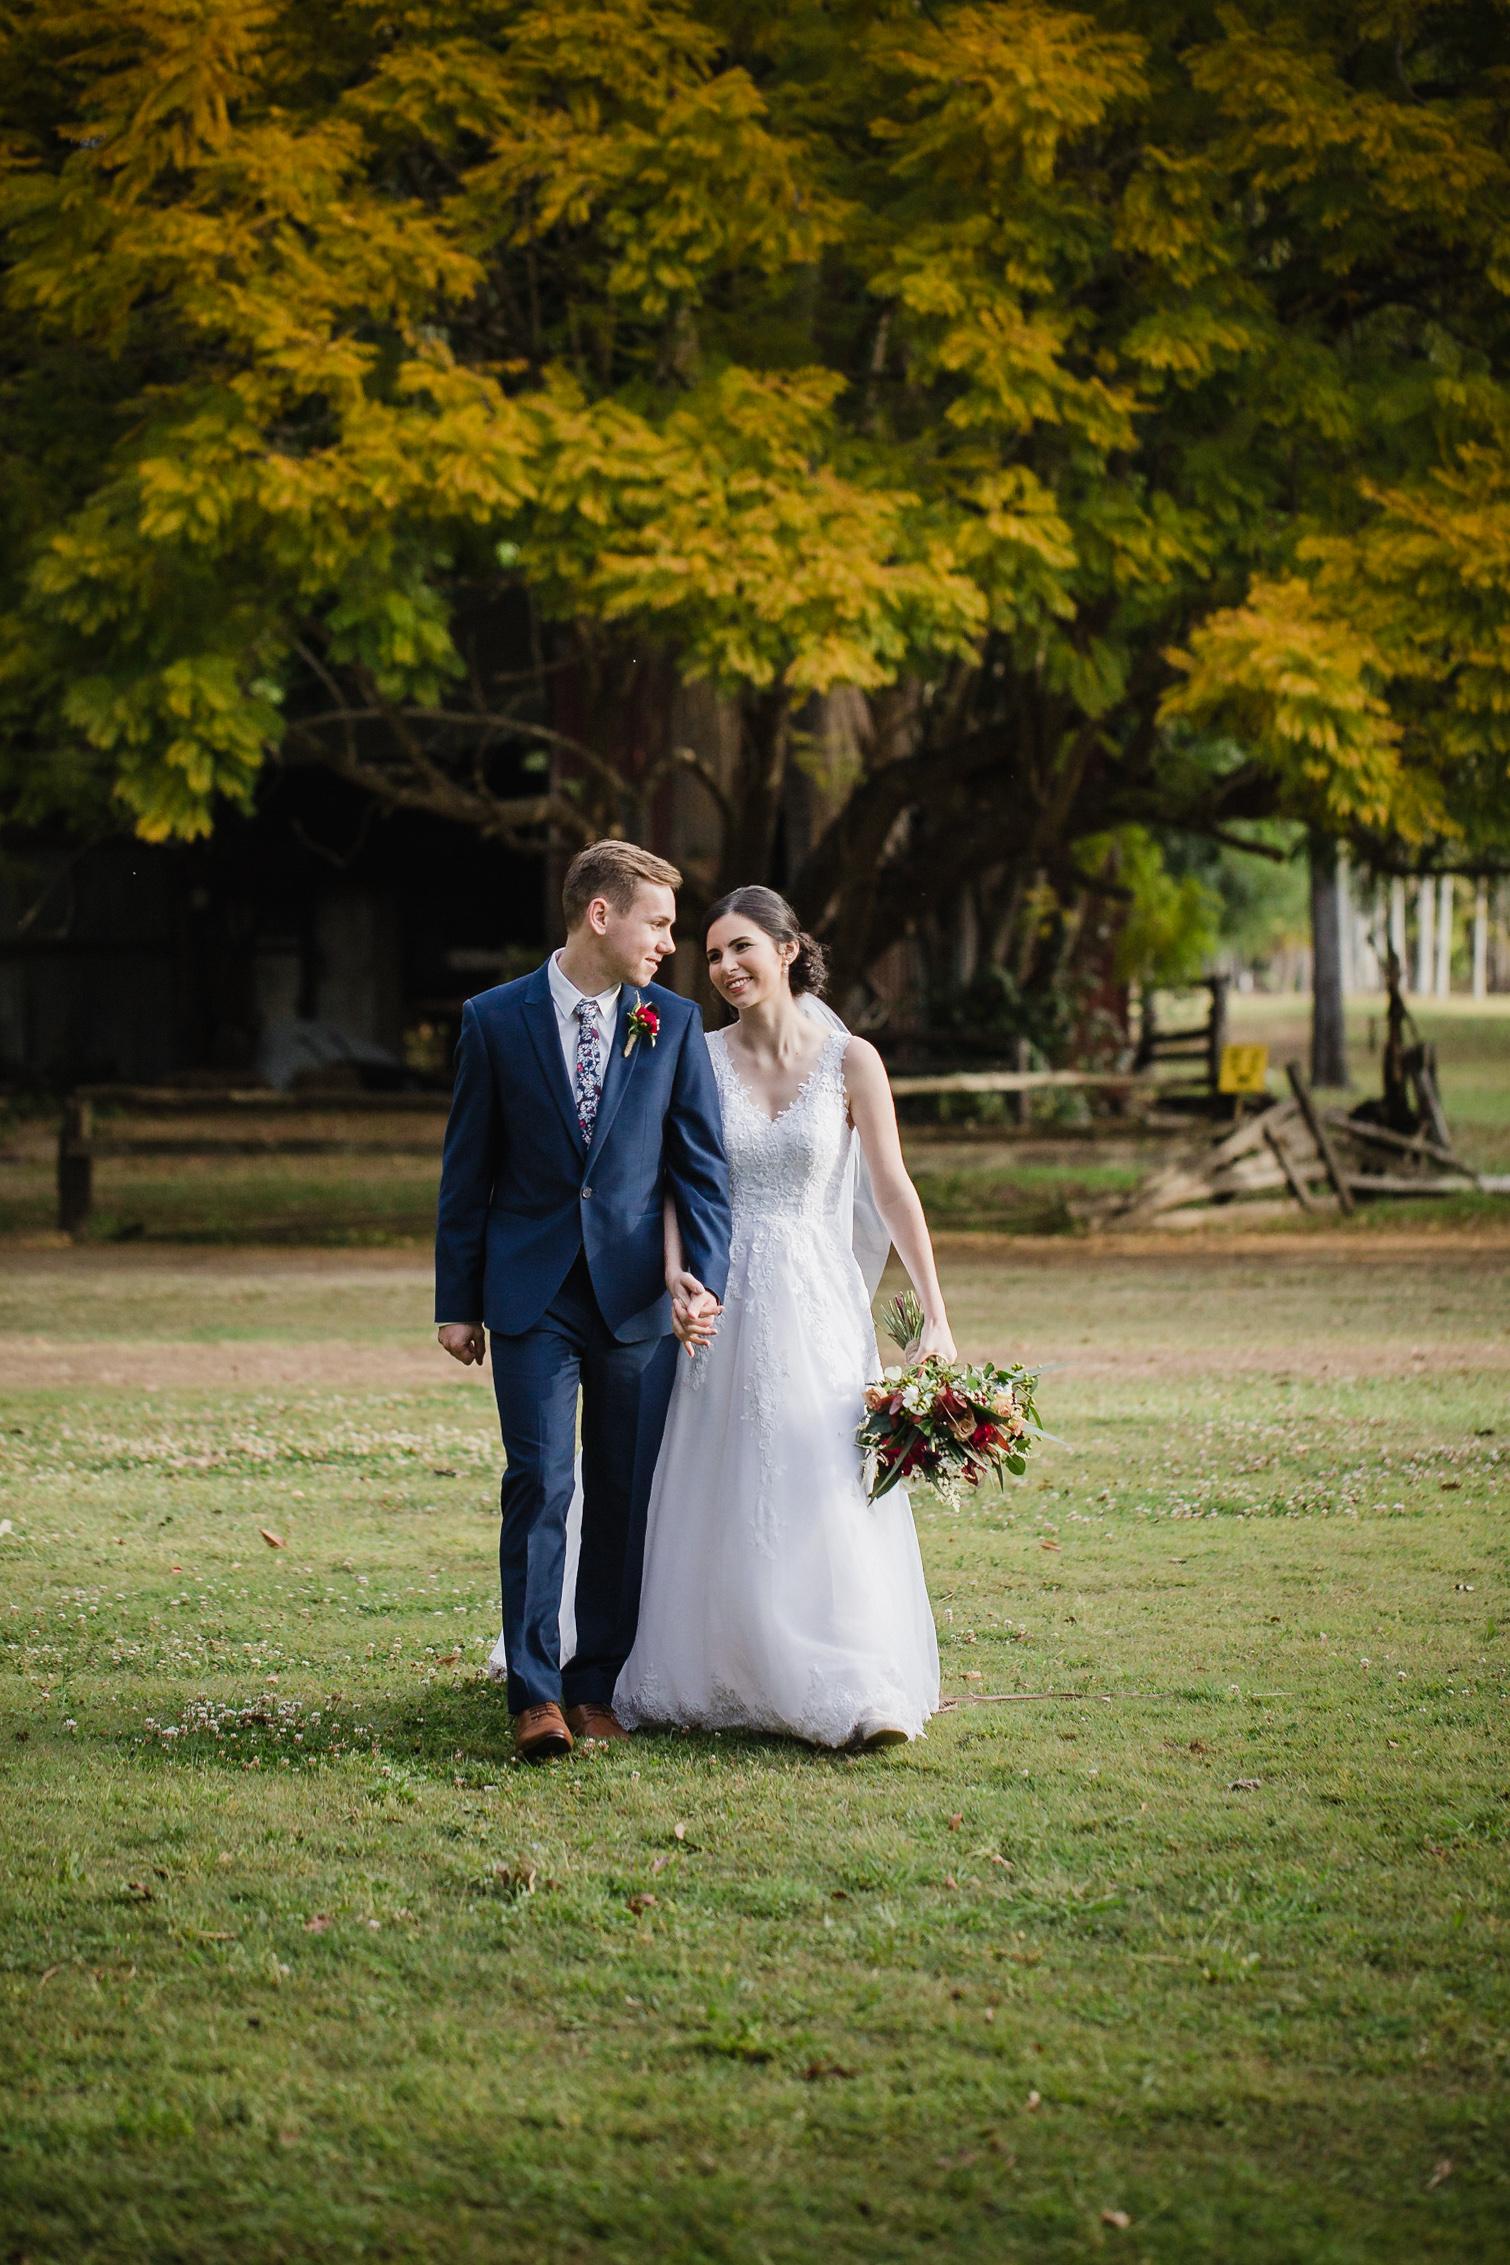 Boomerang_Farm_Gold_Coast_Wedding_Photography-163.jpg